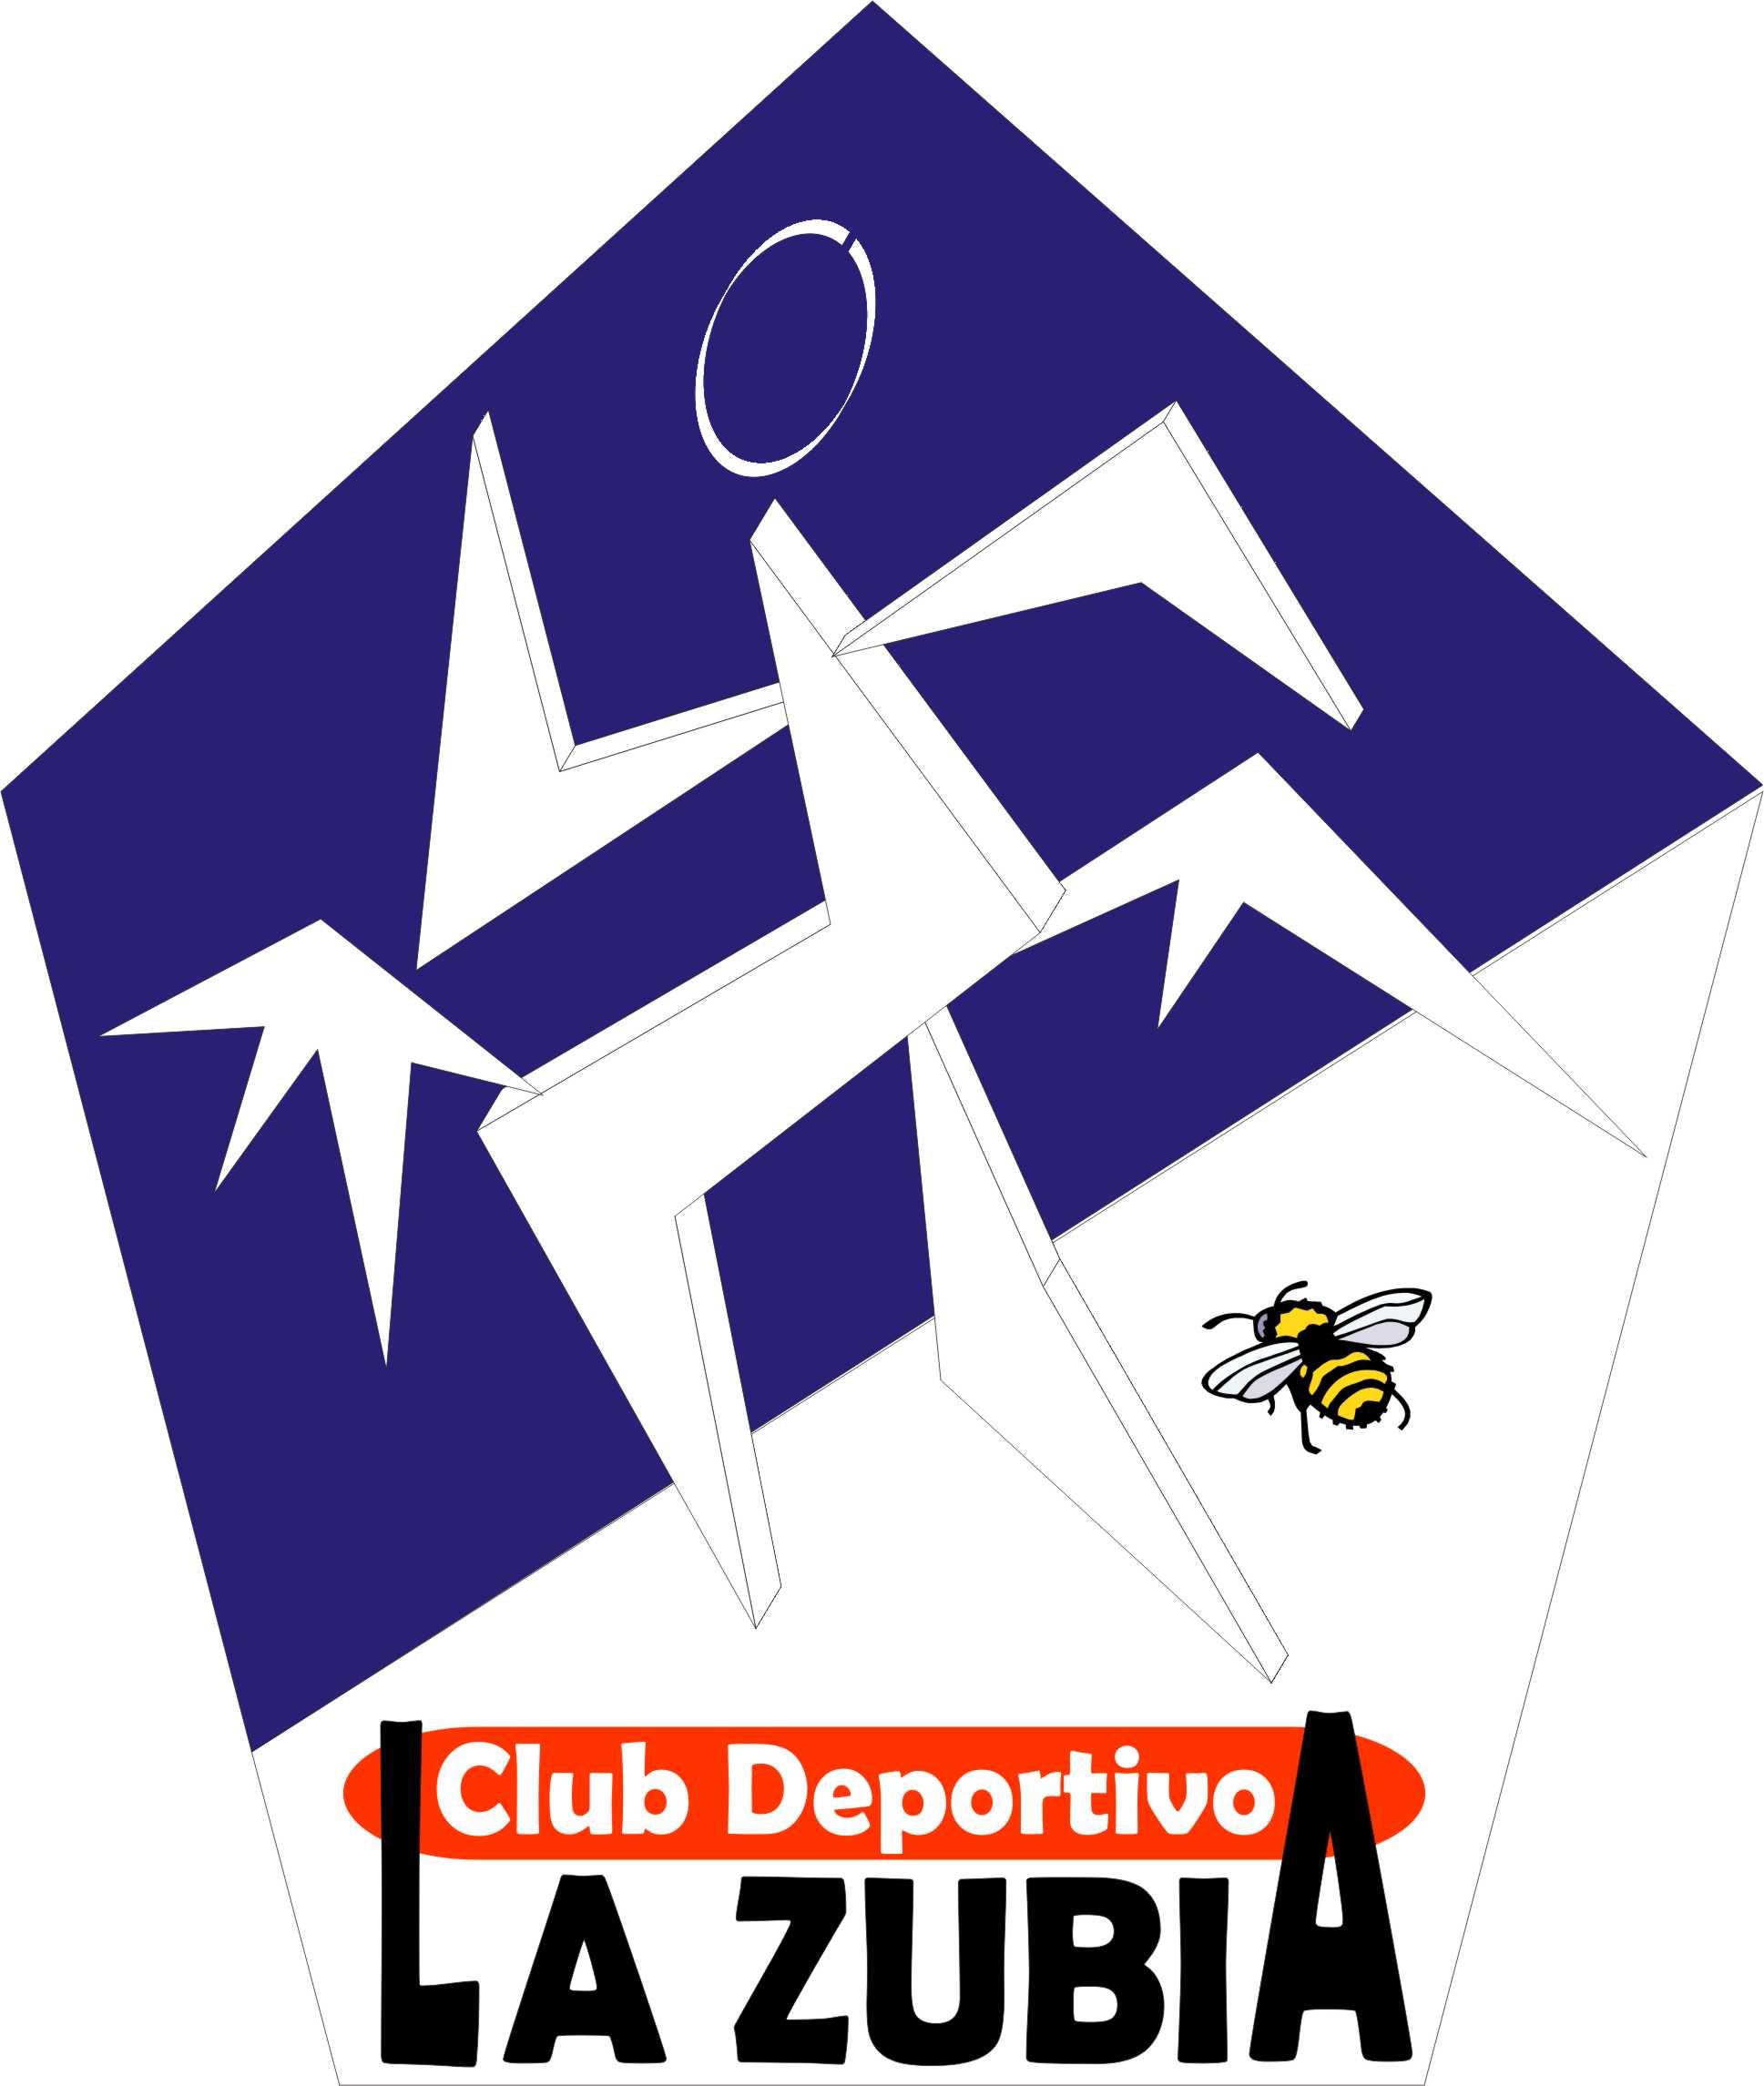 Anagrana club